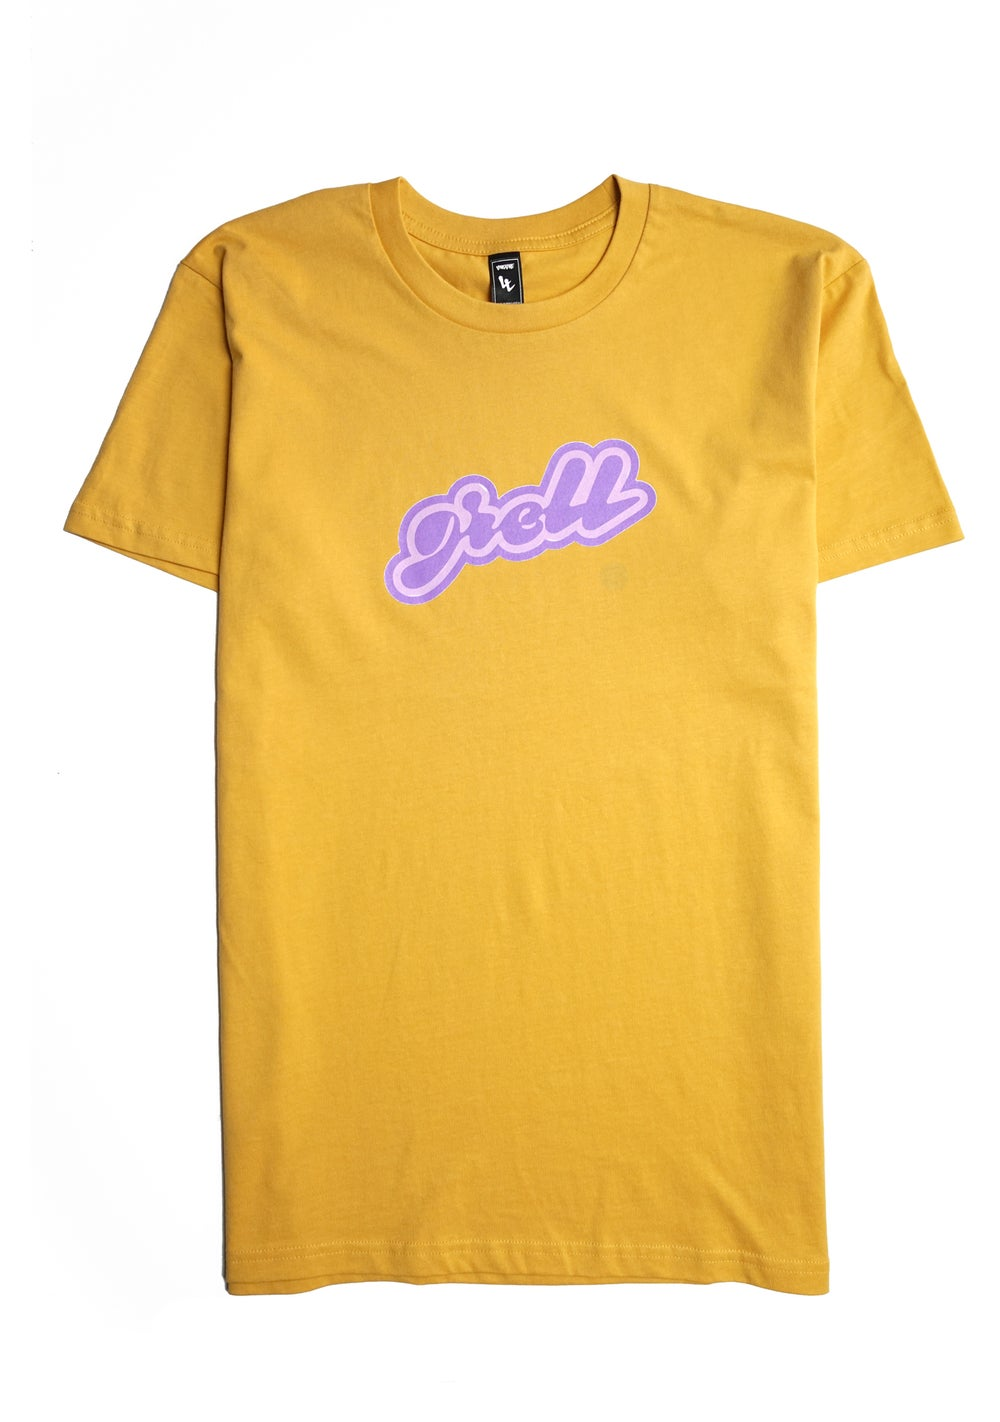 Image of greLL Unisex  Tee -  Mustard  & Royal